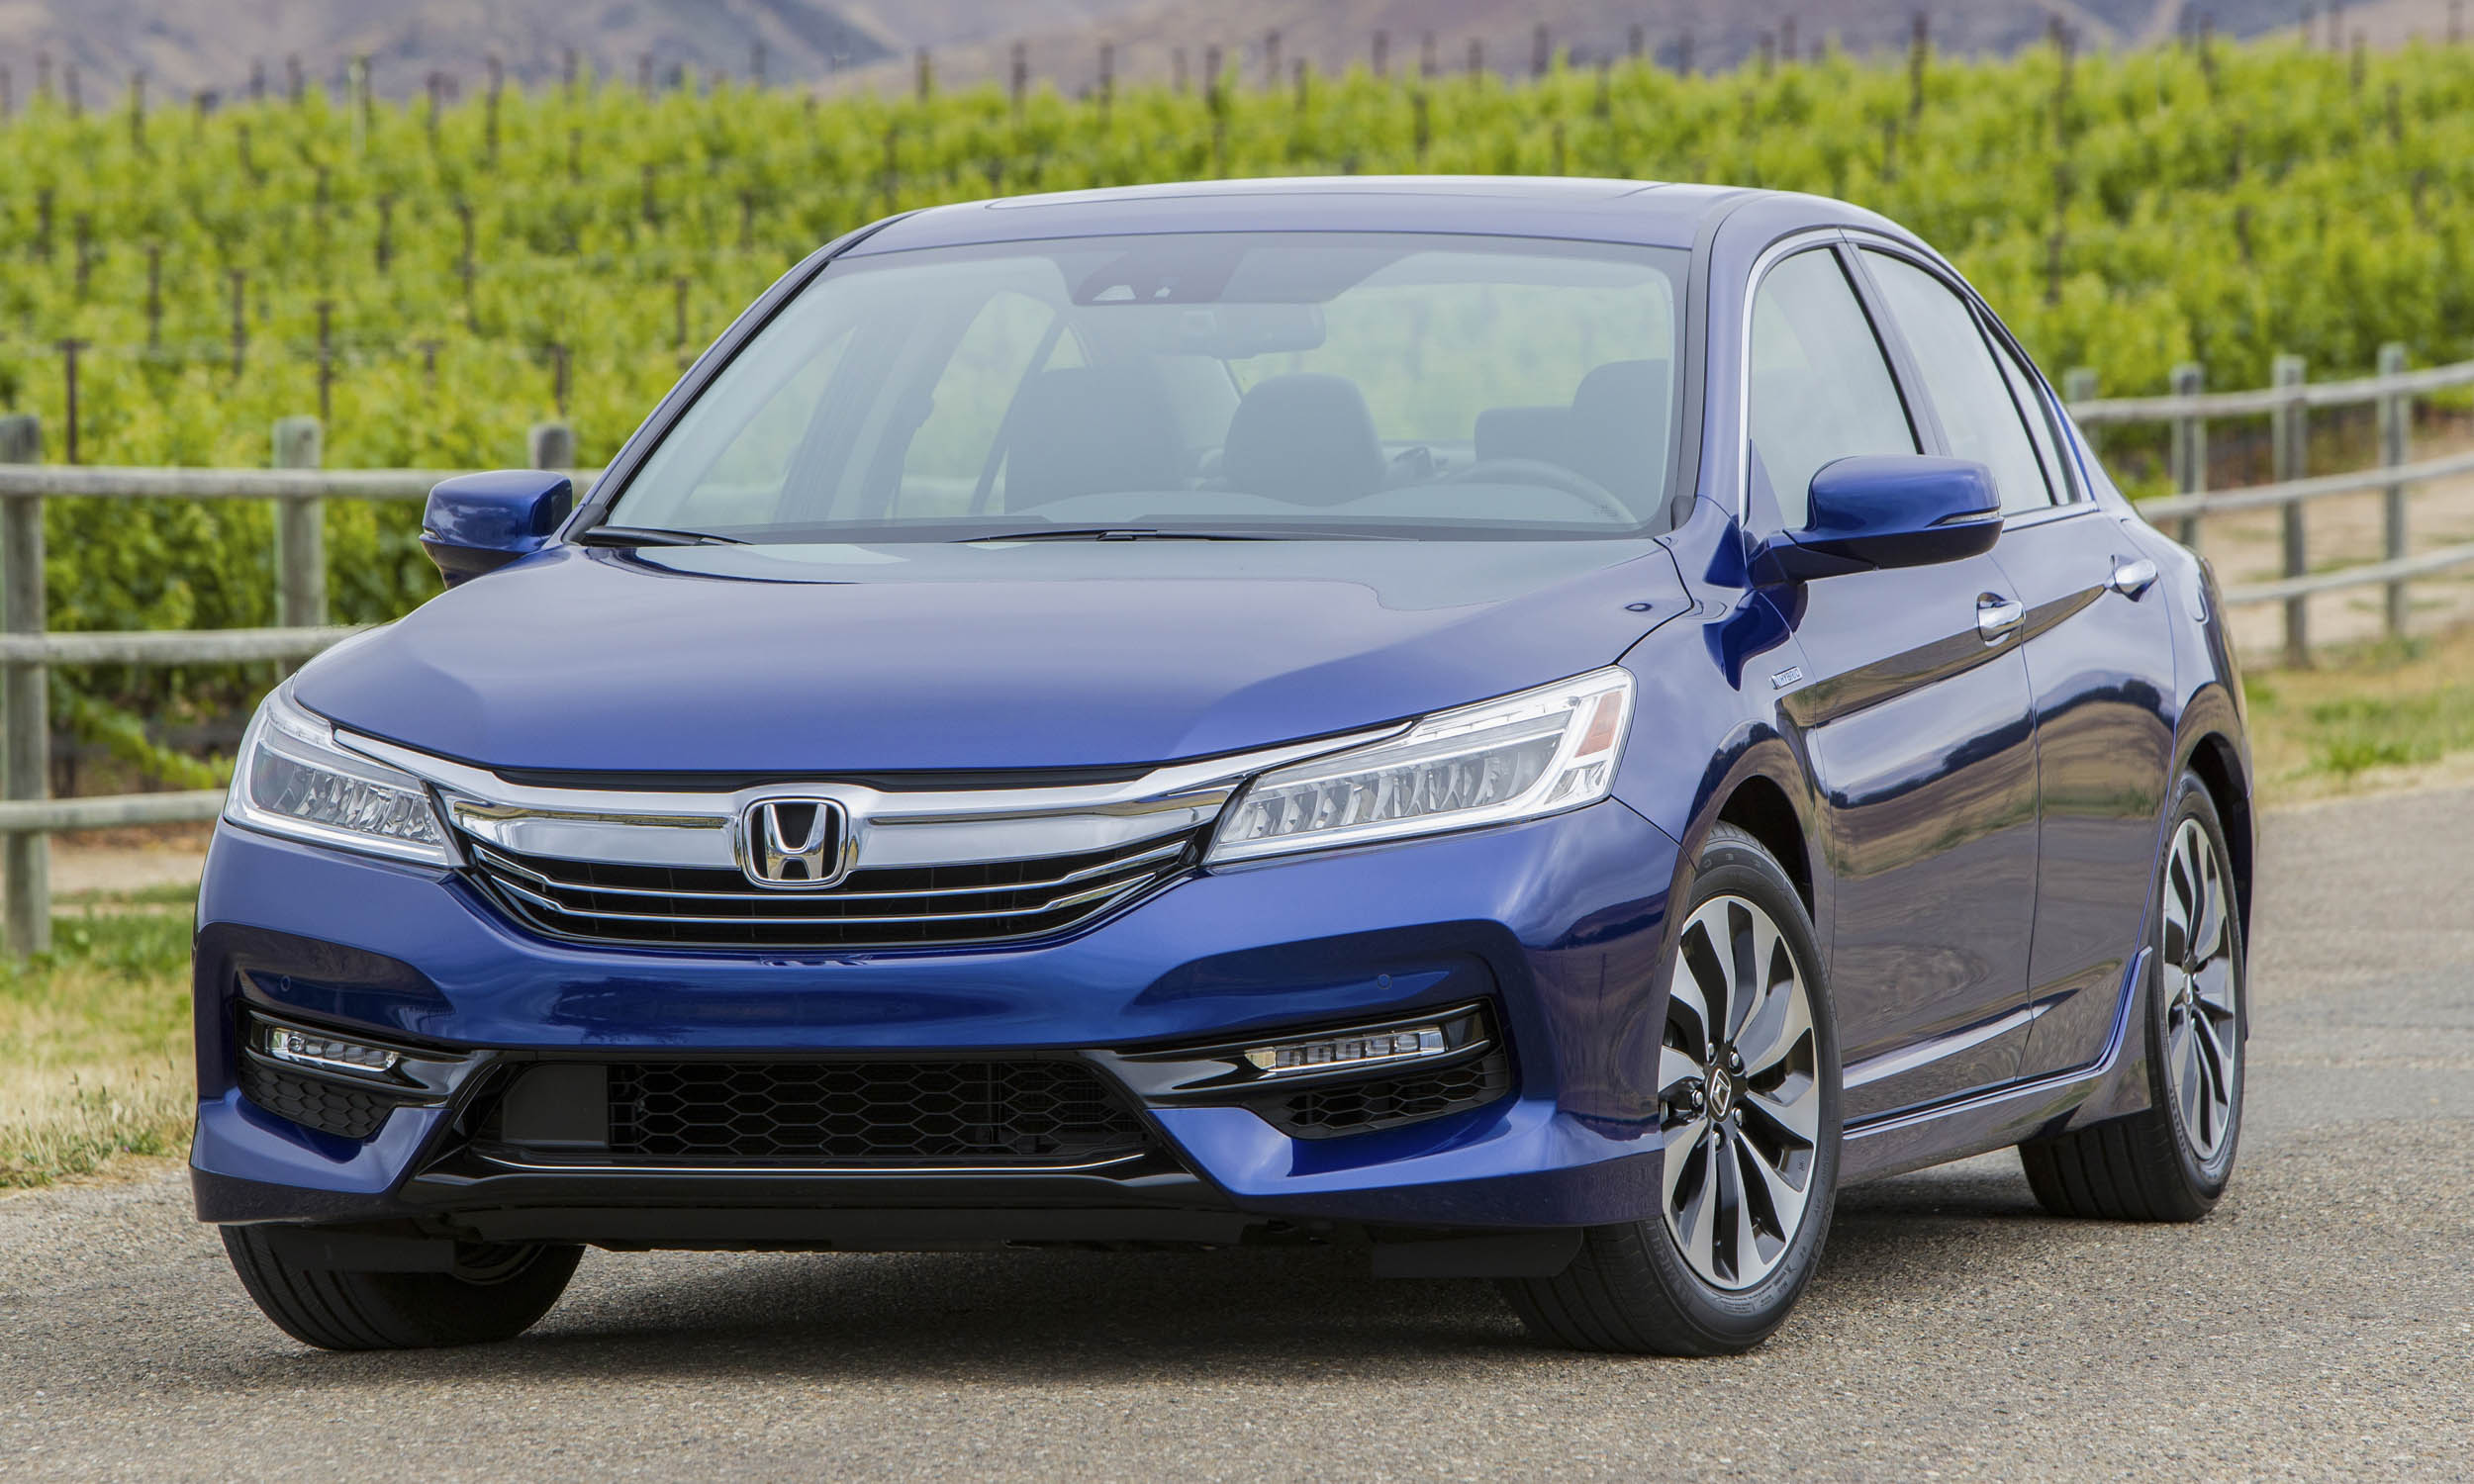 Honda accord hybrid performance 0 60 autos post for Honda accord 0 60